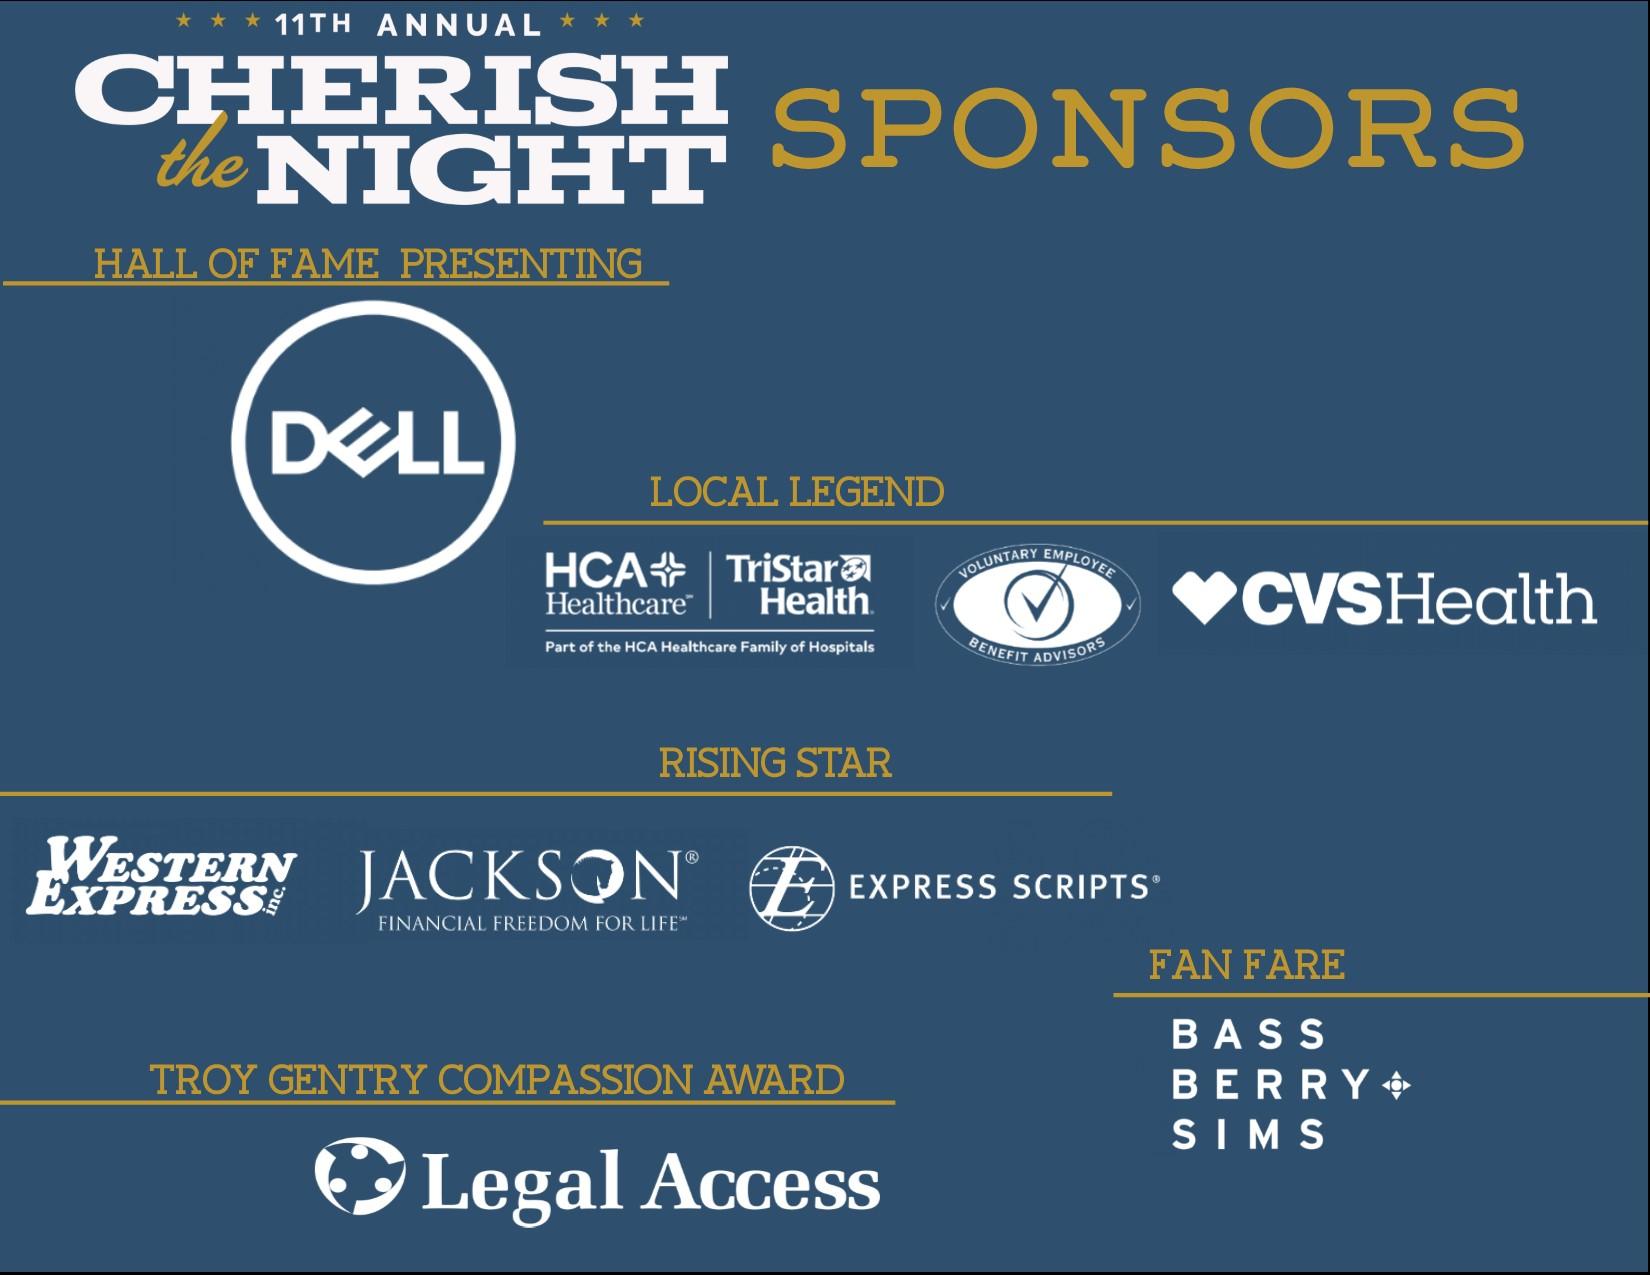 Cherish Sponsors